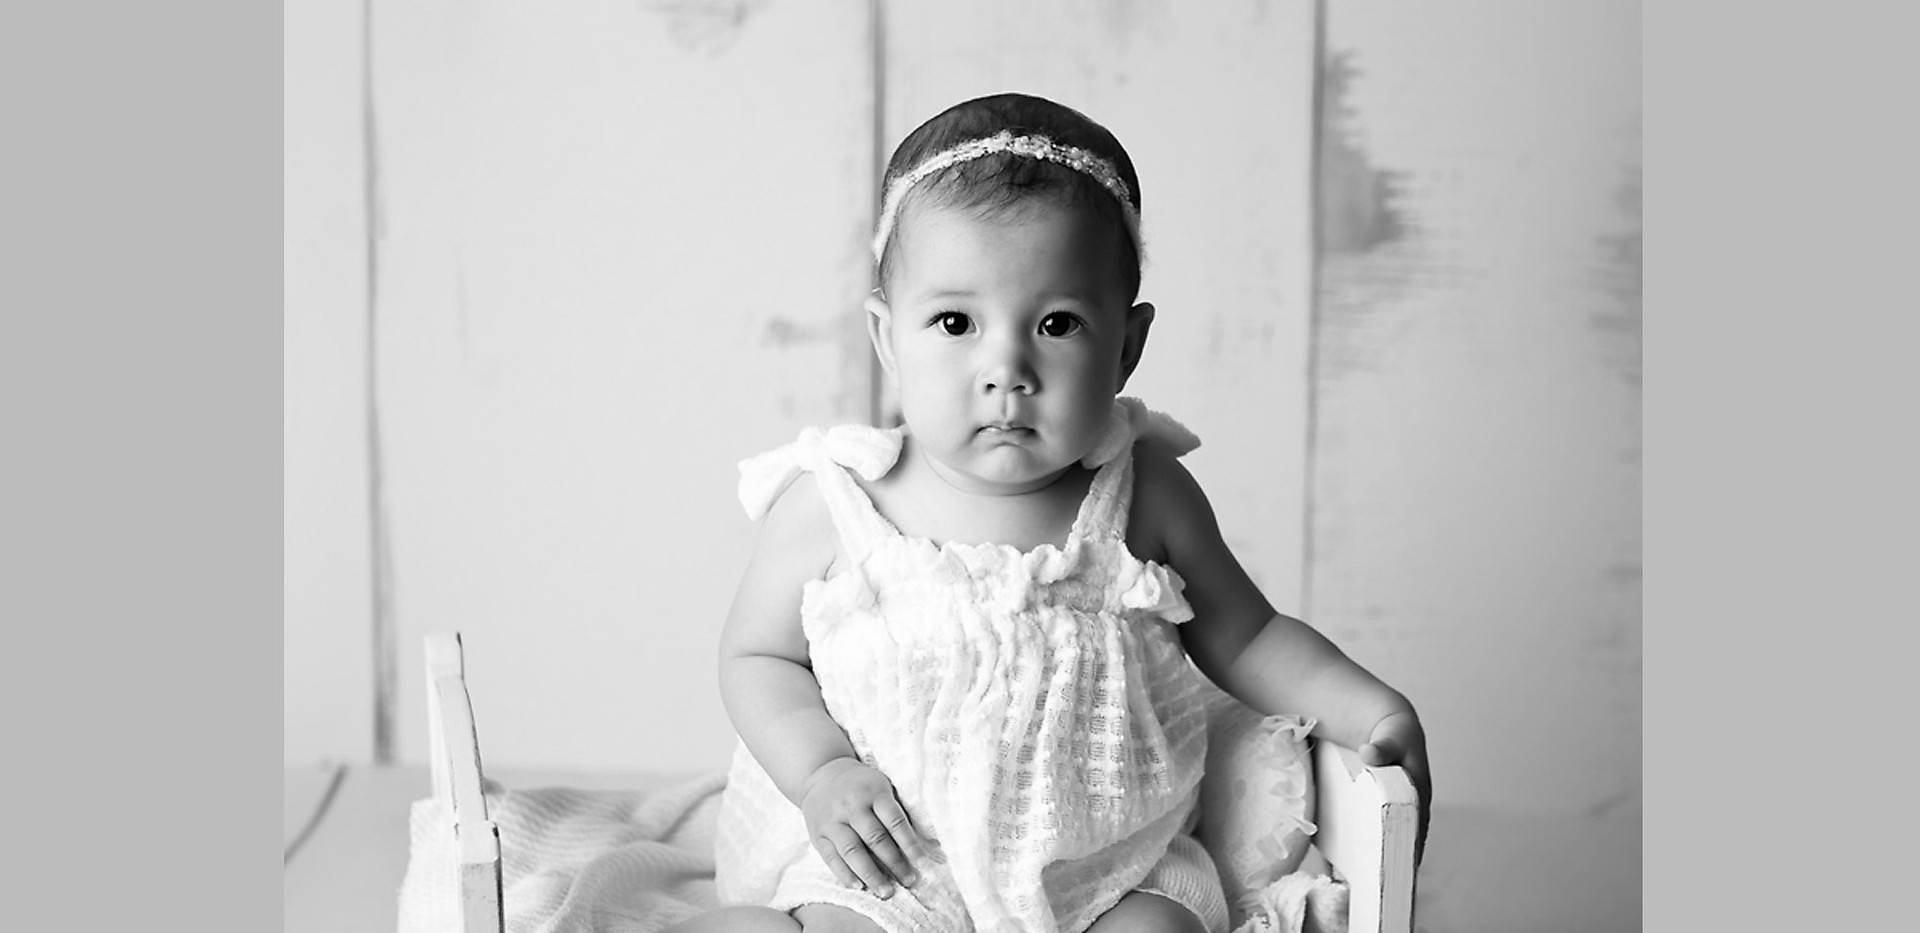 baby-photography-milestone-tiny-bed-prop